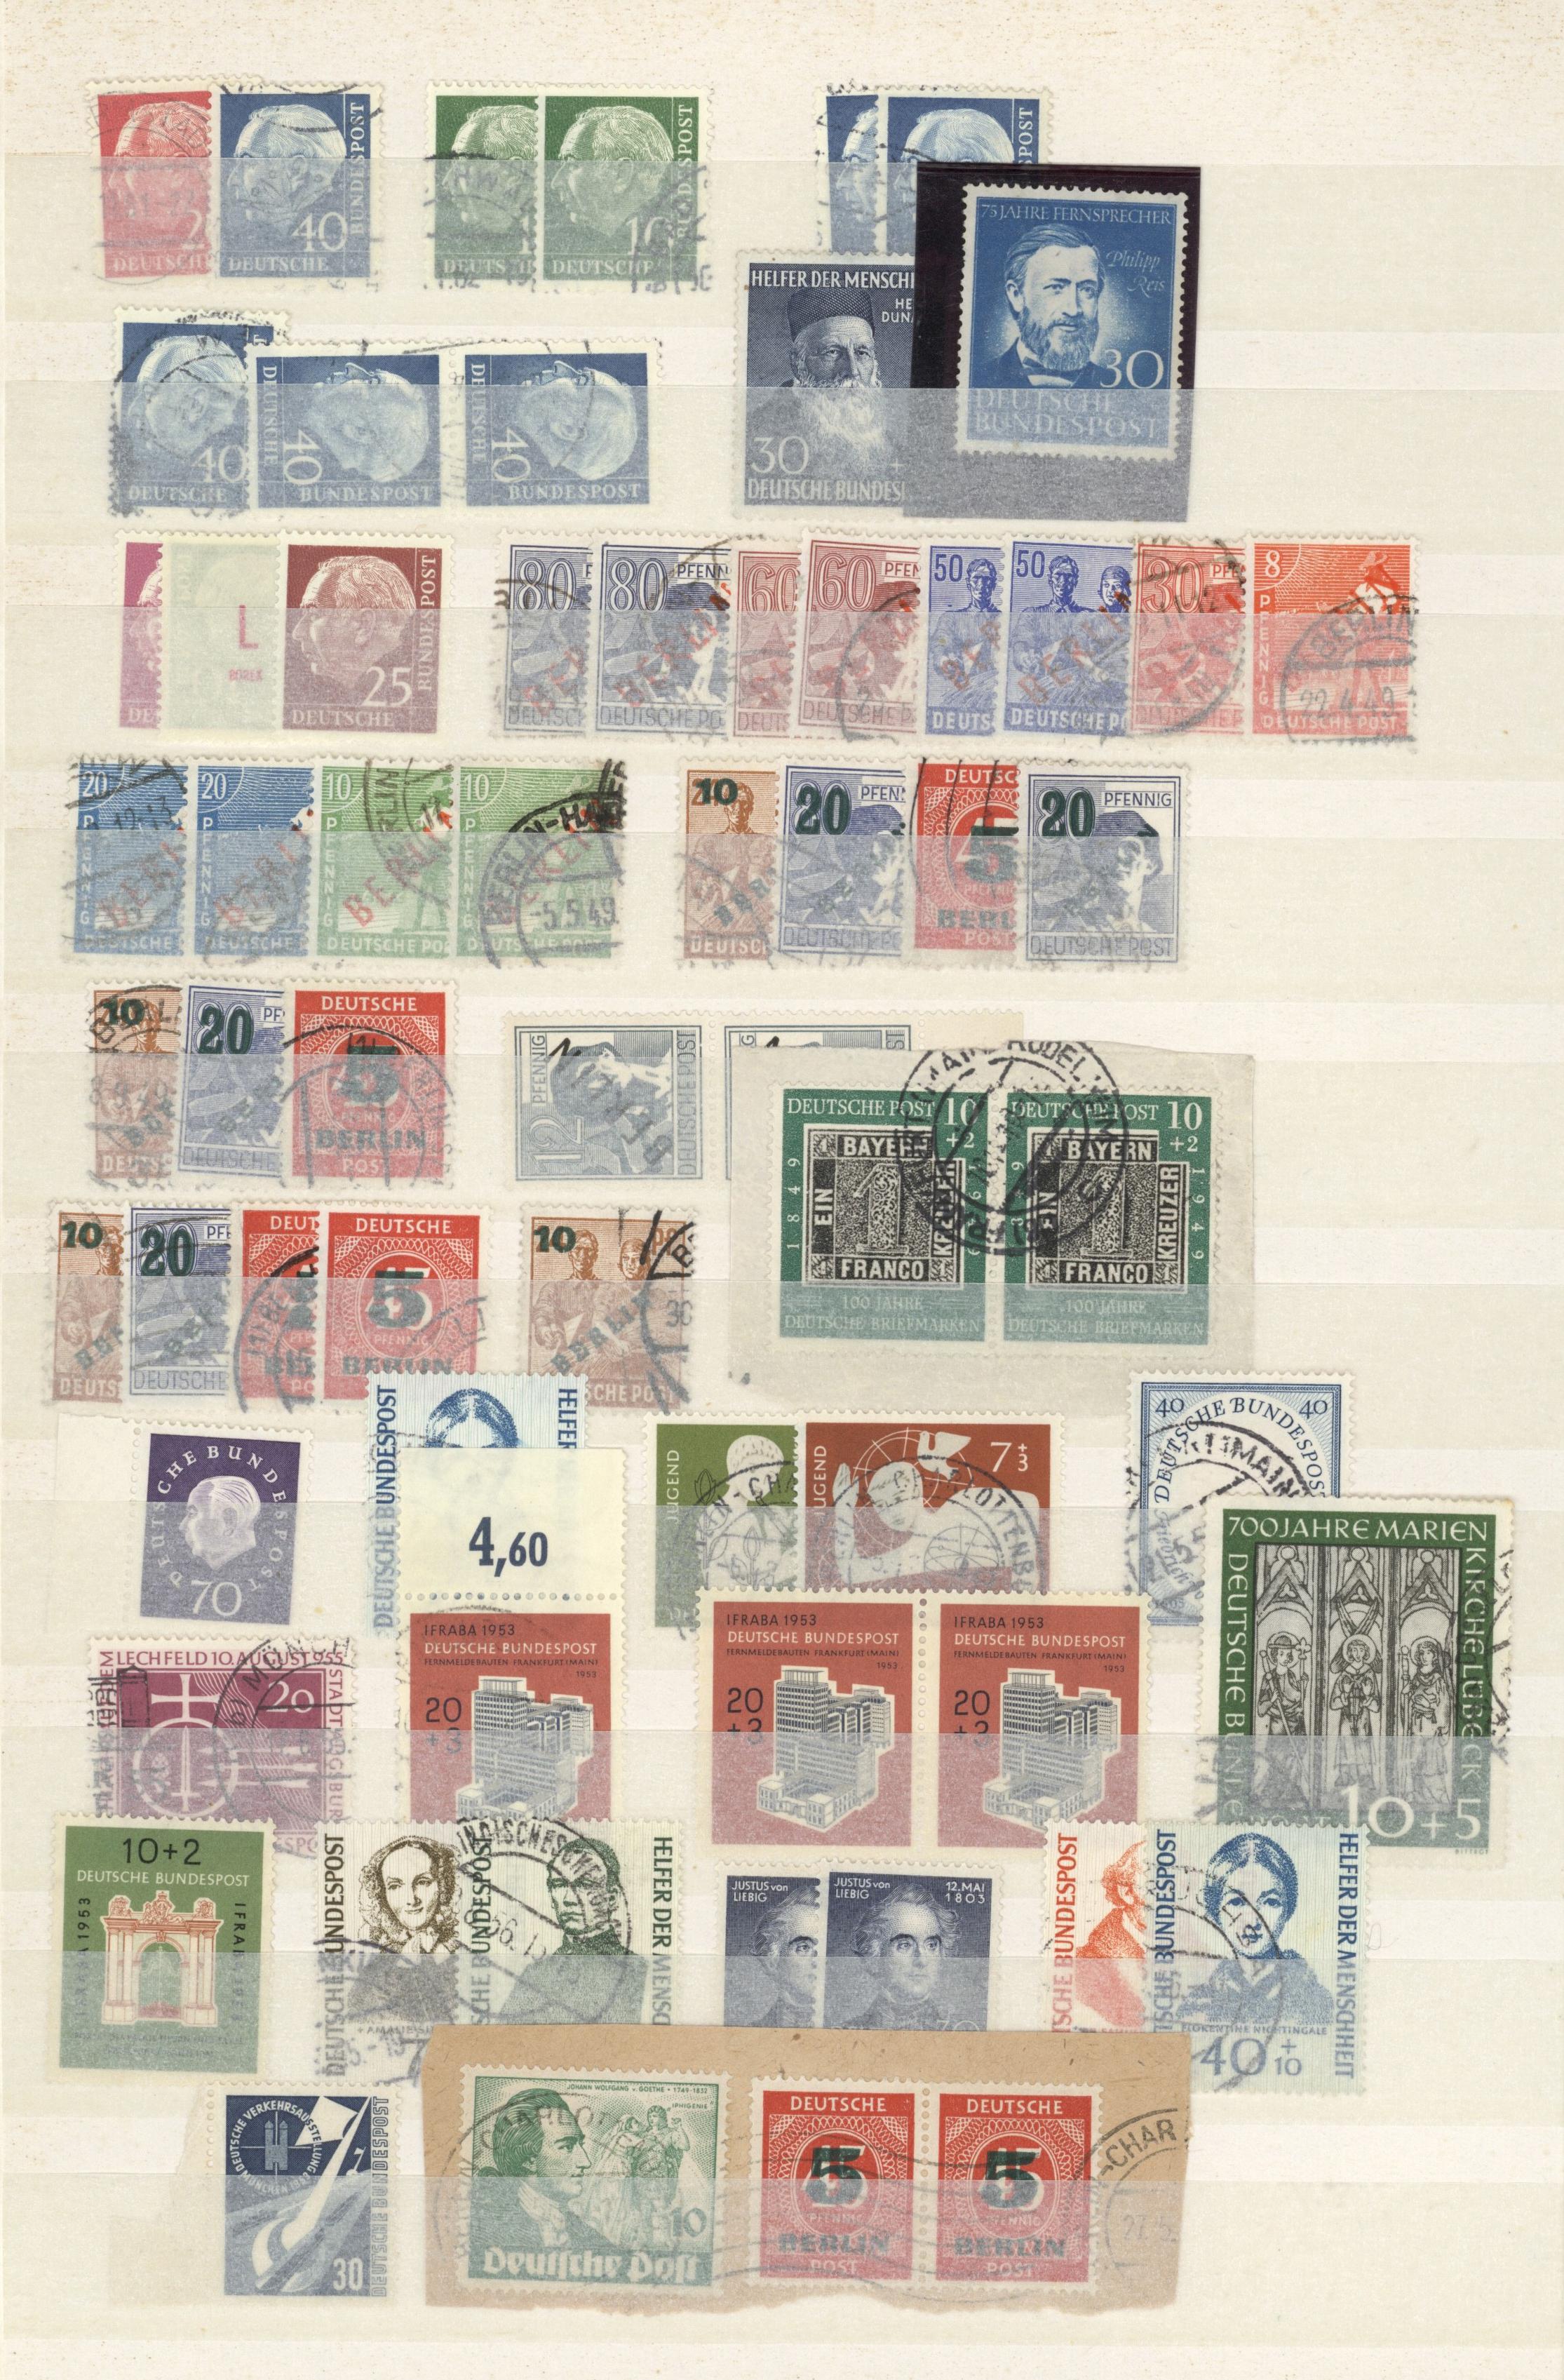 Lot 38099 - bundesrepublik und berlin  -  Auktionshaus Christoph Gärtner GmbH & Co. KG Collections Germany,  Collections Supplement, Surprise boxes #39 Day 7